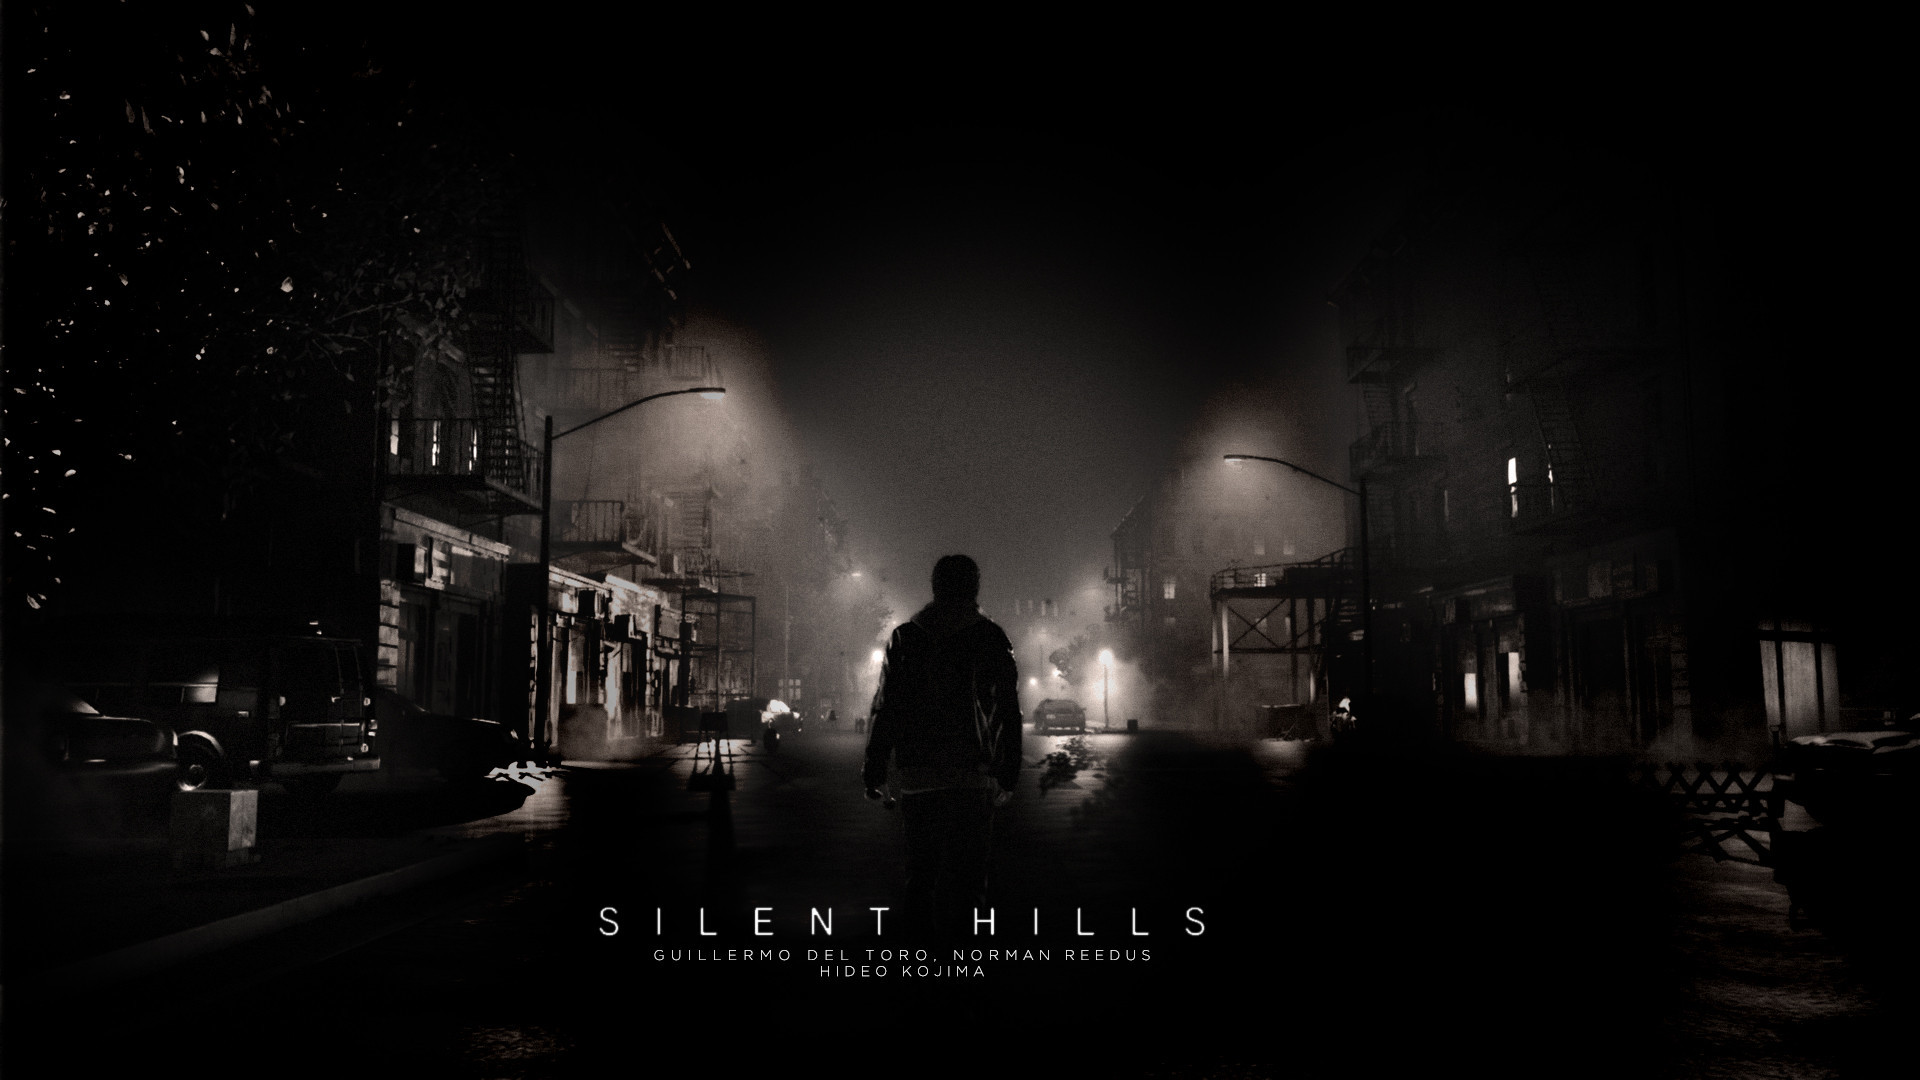 Silent Hills 1080p Wallpaper (Custom by myself)